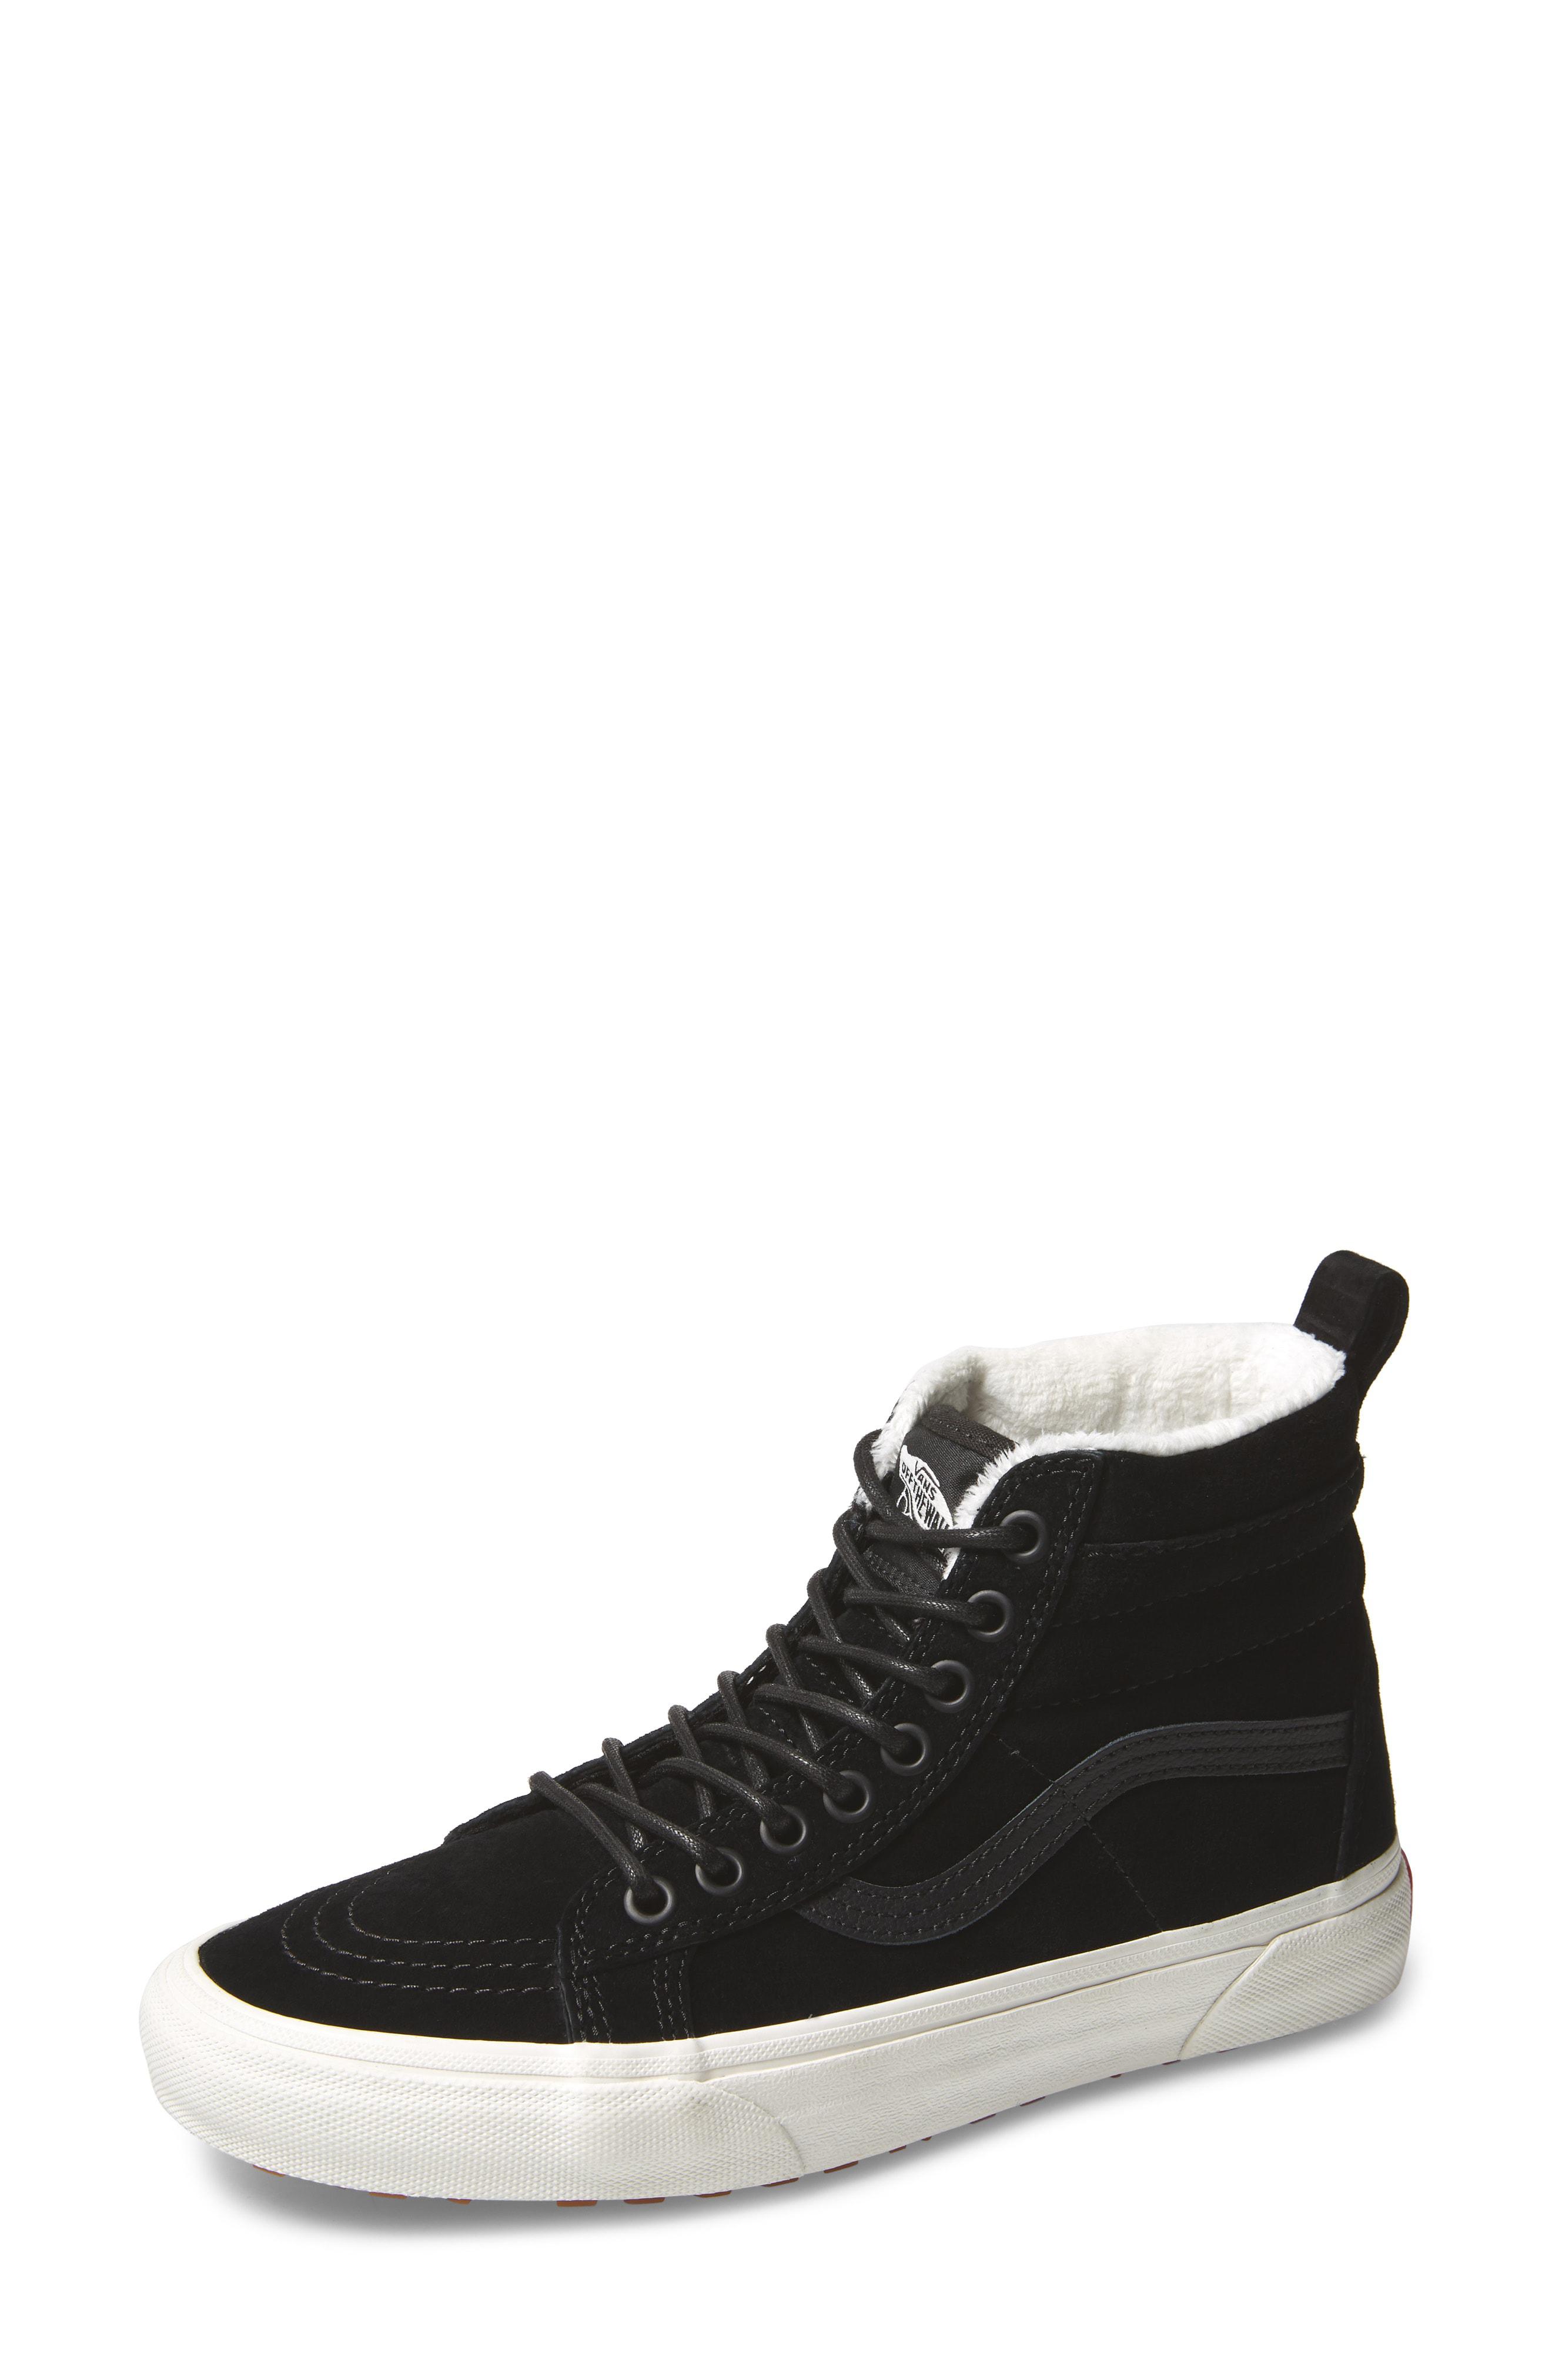 c7a38f0c9e Vans Sk8-Hi Mte Sneaker In Black  Marshmallow Suede